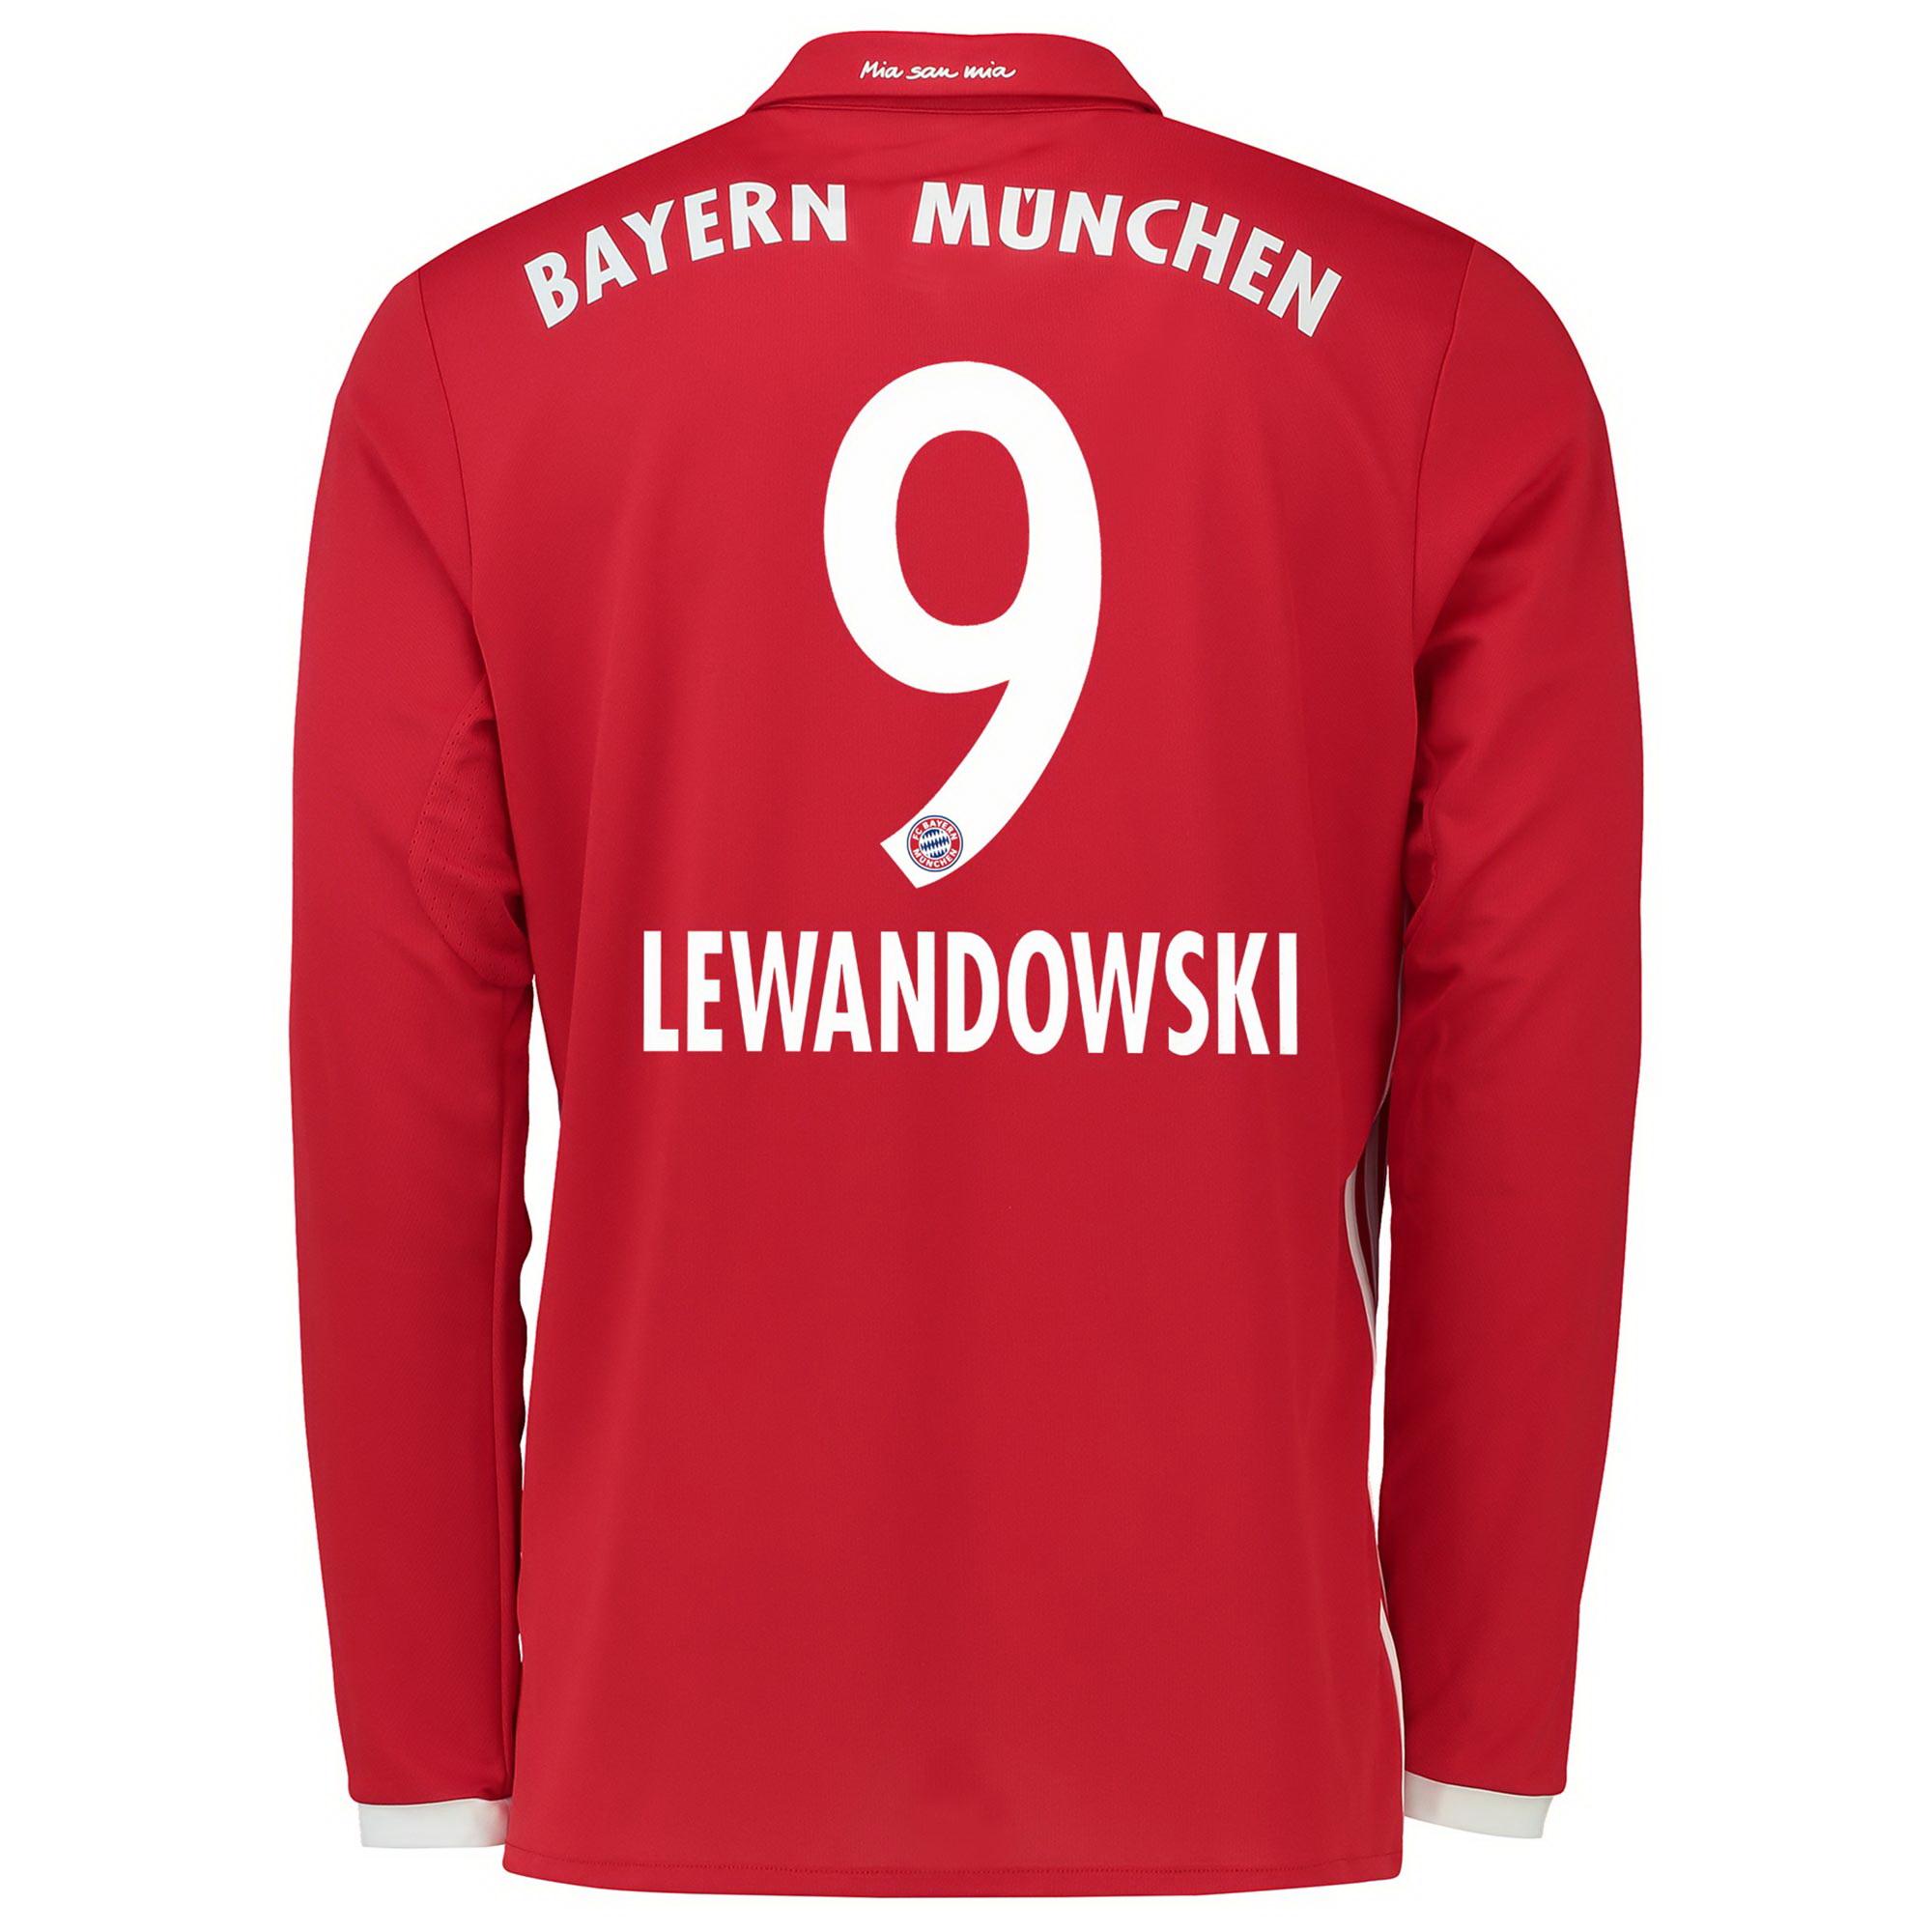 Image of Bayern Munich Home Shirt 2016-17 - Kids - Long Sleeve with Lewandowski, Red